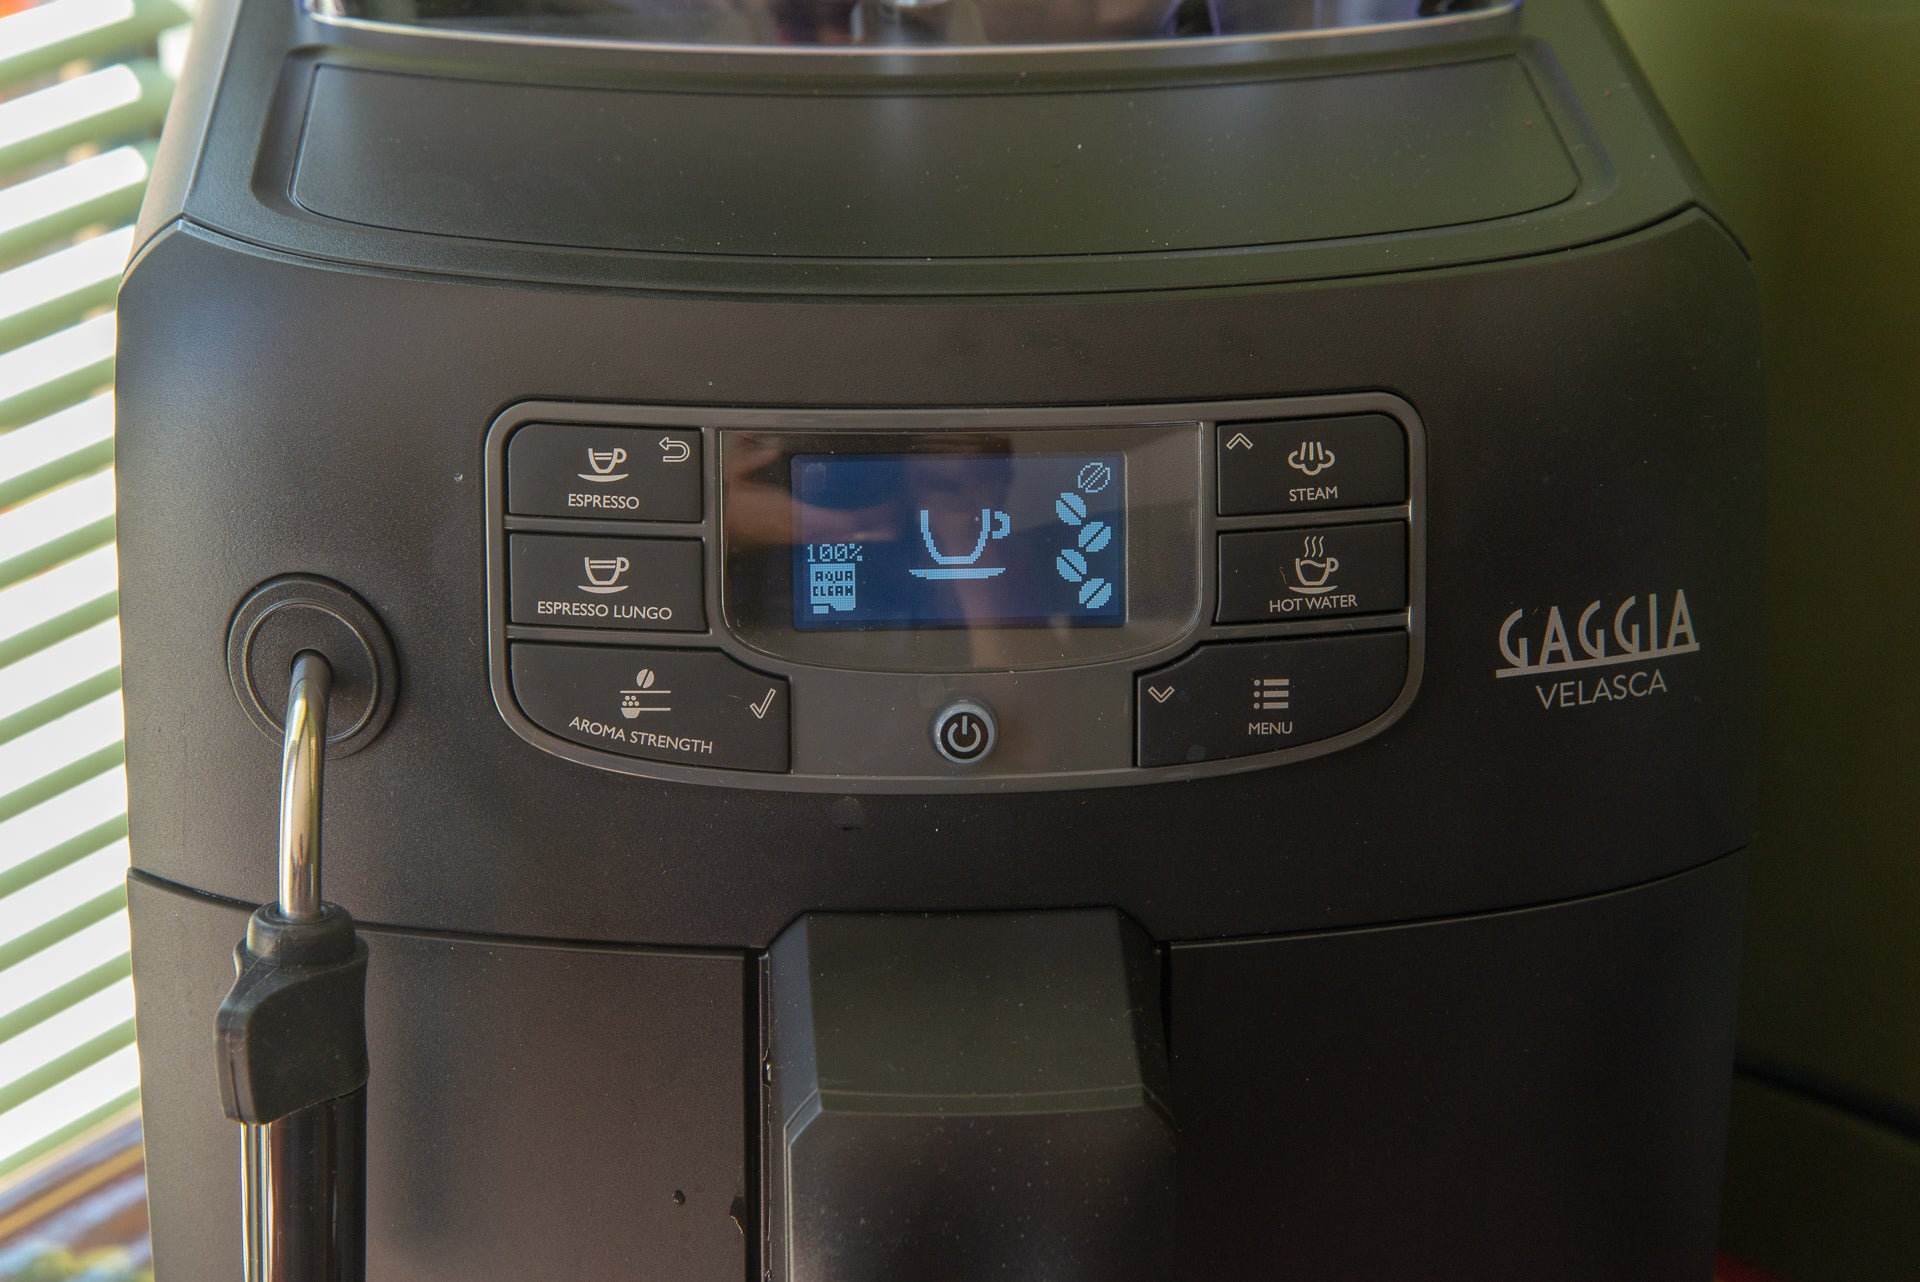 Gaggia Velasca controls